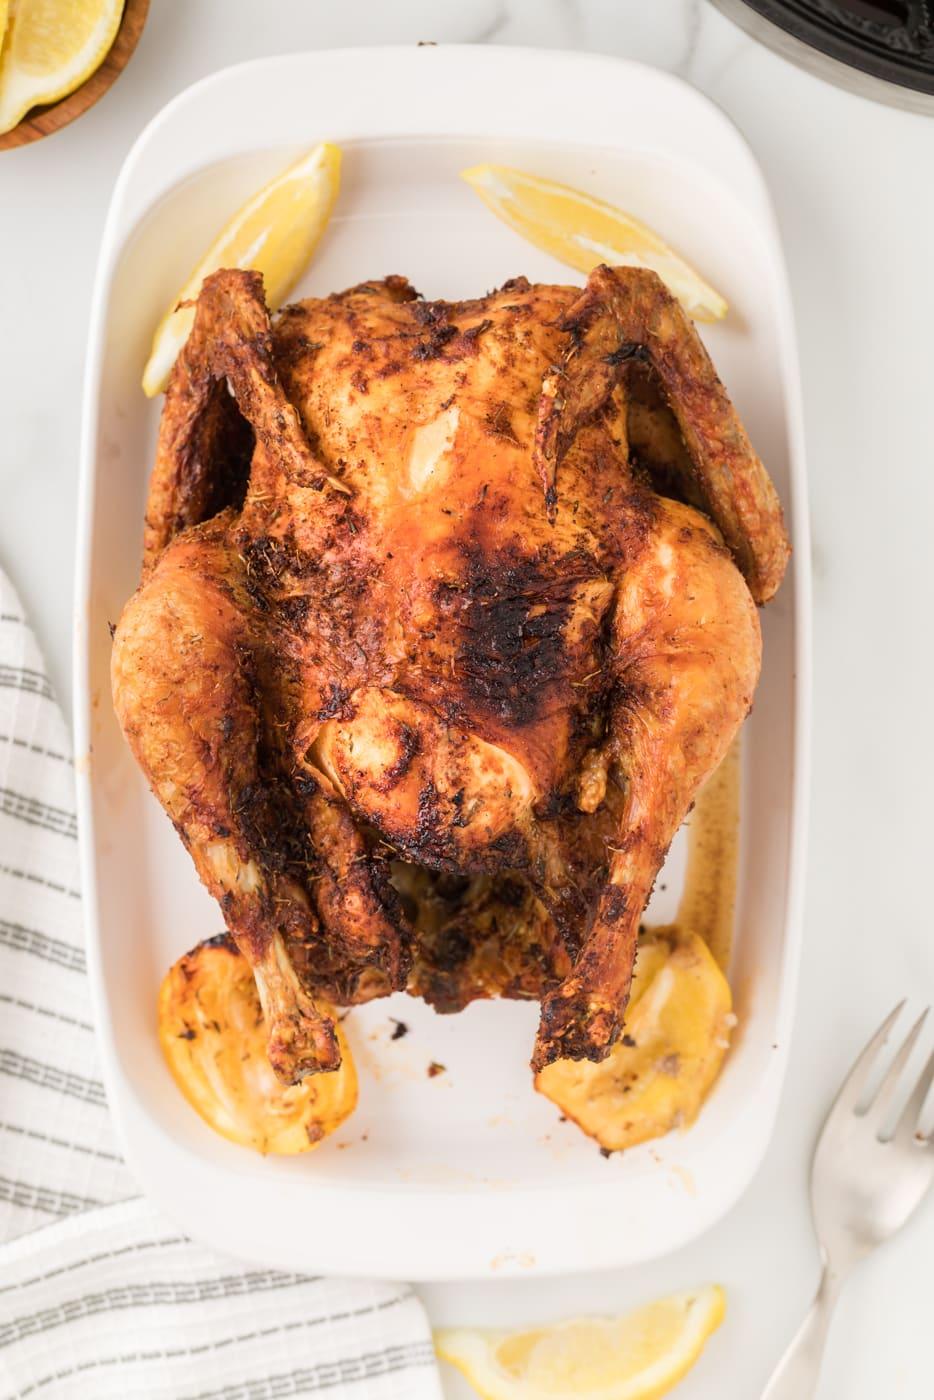 Air fryer roast chicken in a serving dish